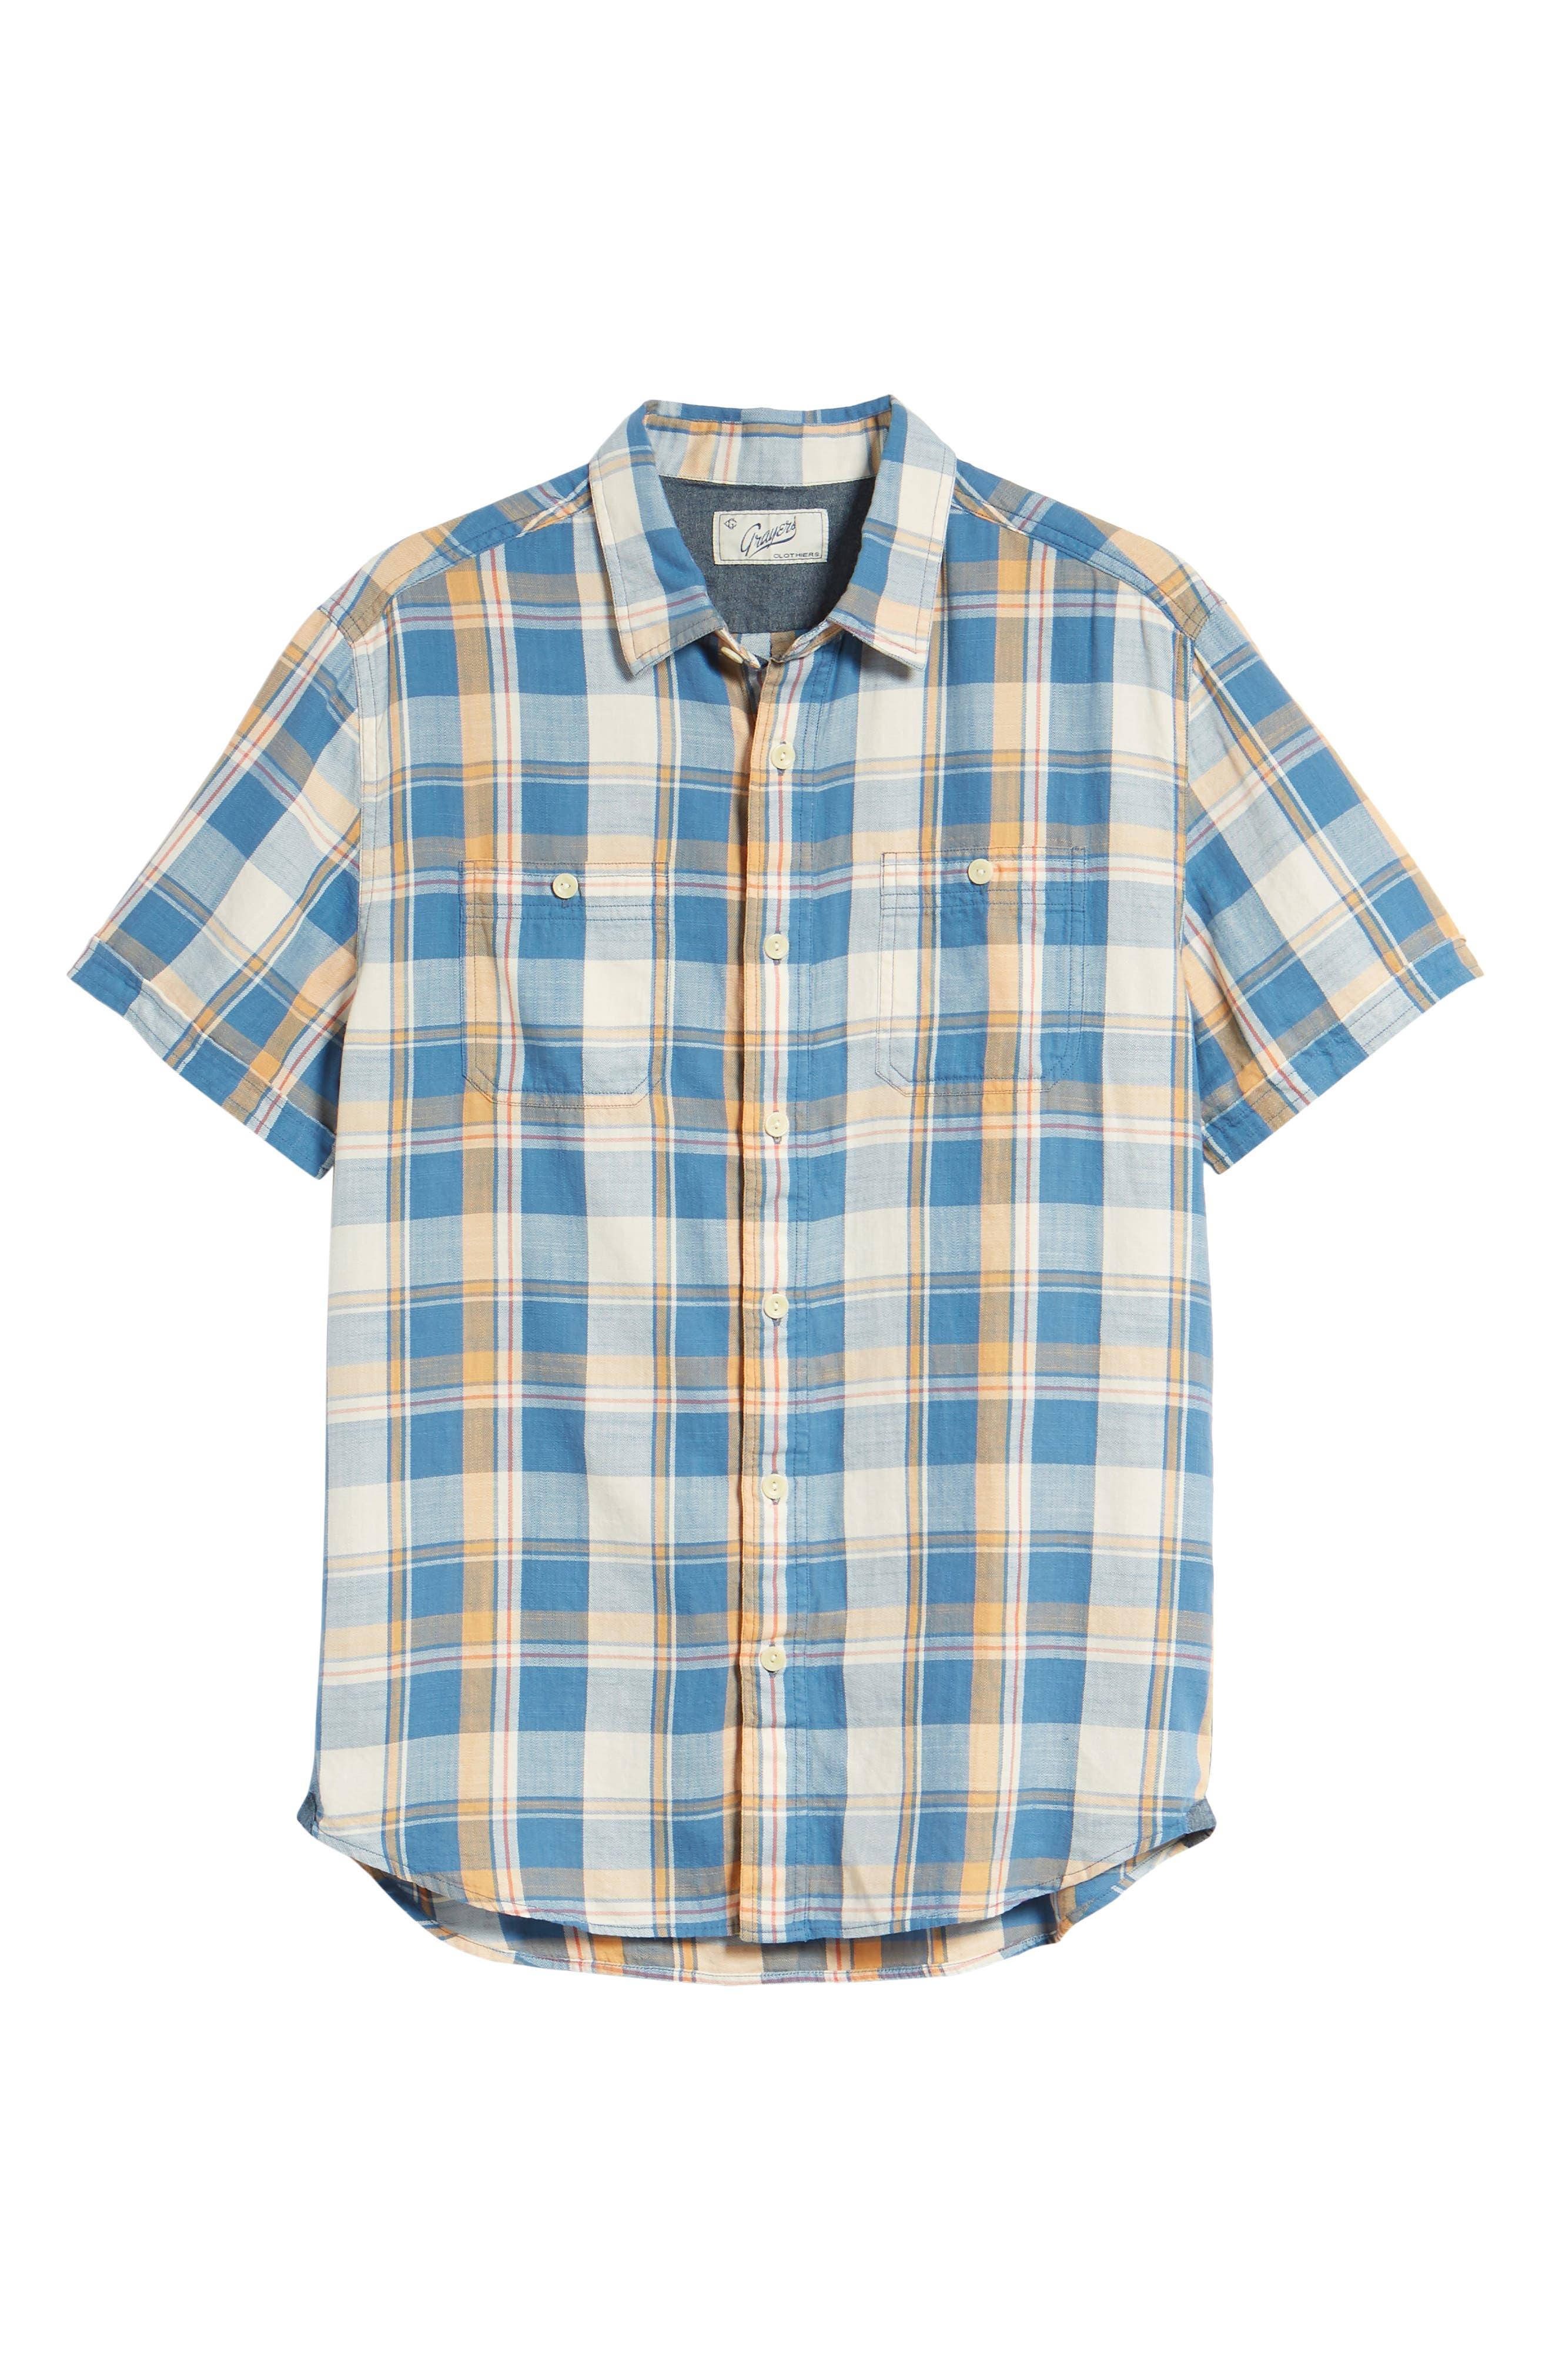 Sherman Plaid Slub Twill Sport Shirt,                             Alternate thumbnail 6, color,                             Blue Mustard Red